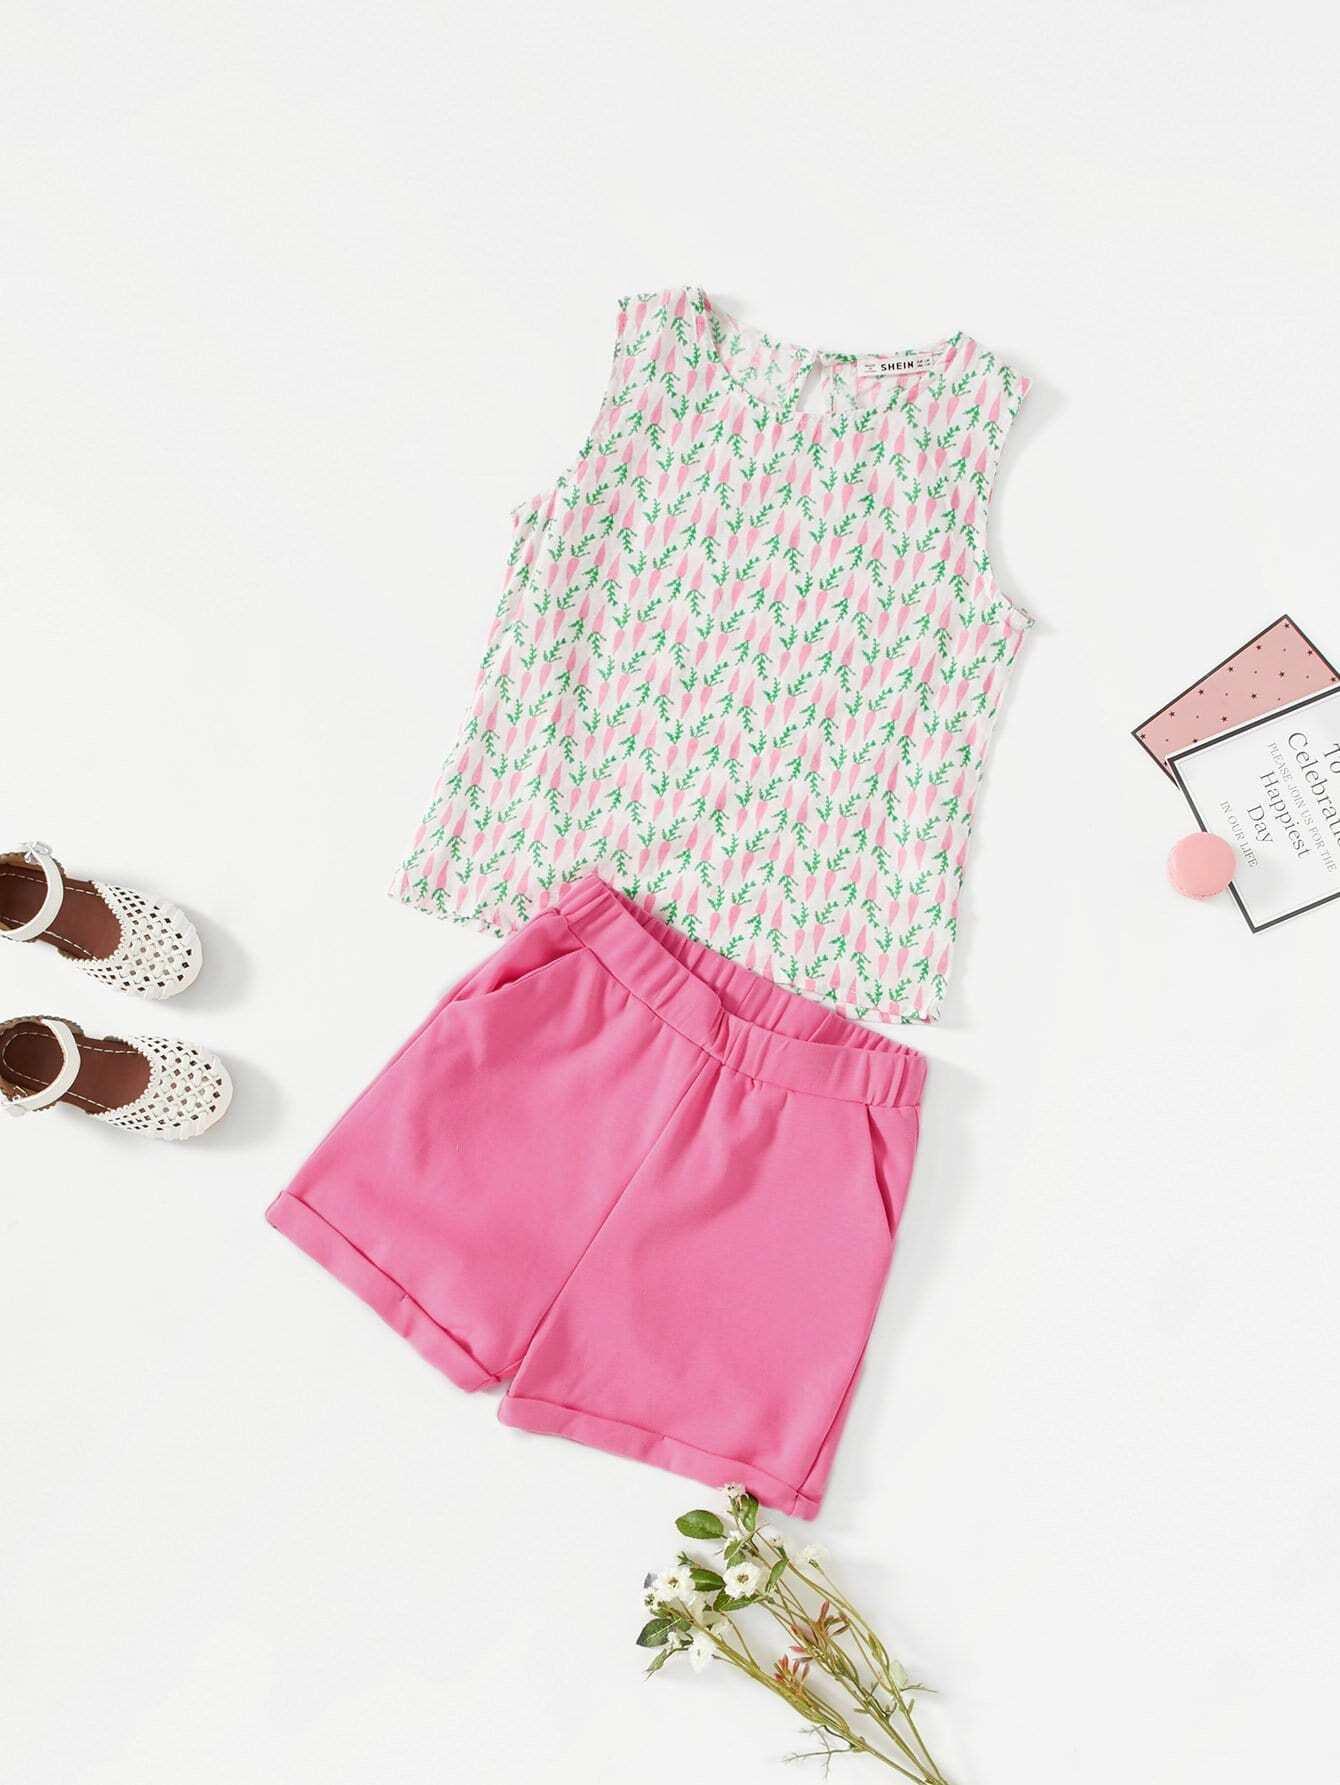 Girls Carrot Print Sleeveless Top & Cuffed Shorts Set давид п мой первый атлас мира isbn 9785389090071